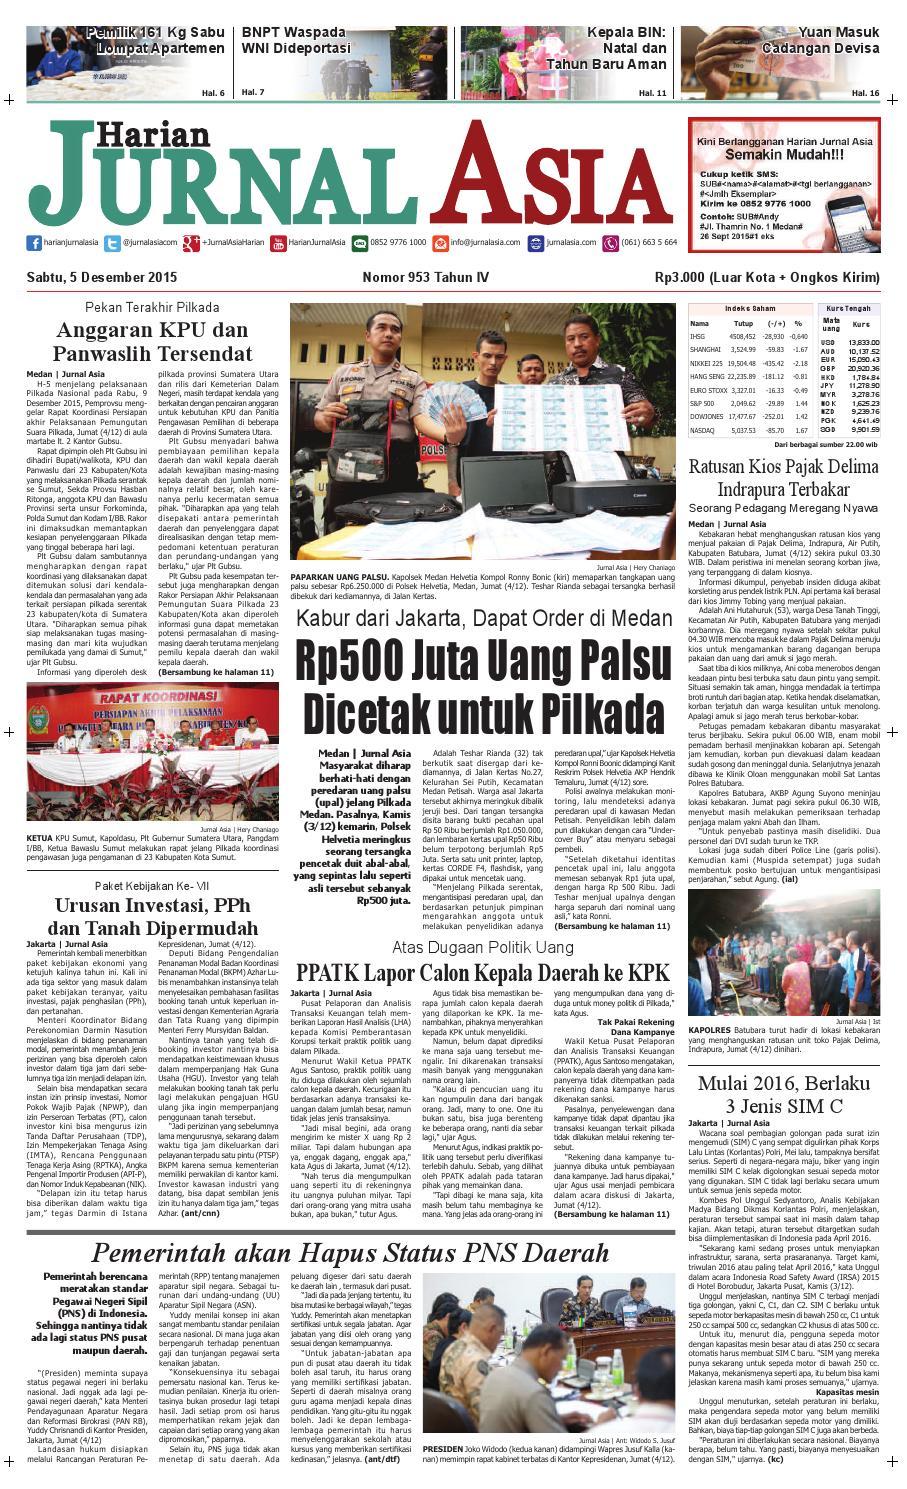 Harian Jurnal Asia Edisi Sabtu 05 Desember 2015 By Kopibubuk Robusta Toko Rezeki Akumandiri Malang Medan Issuu